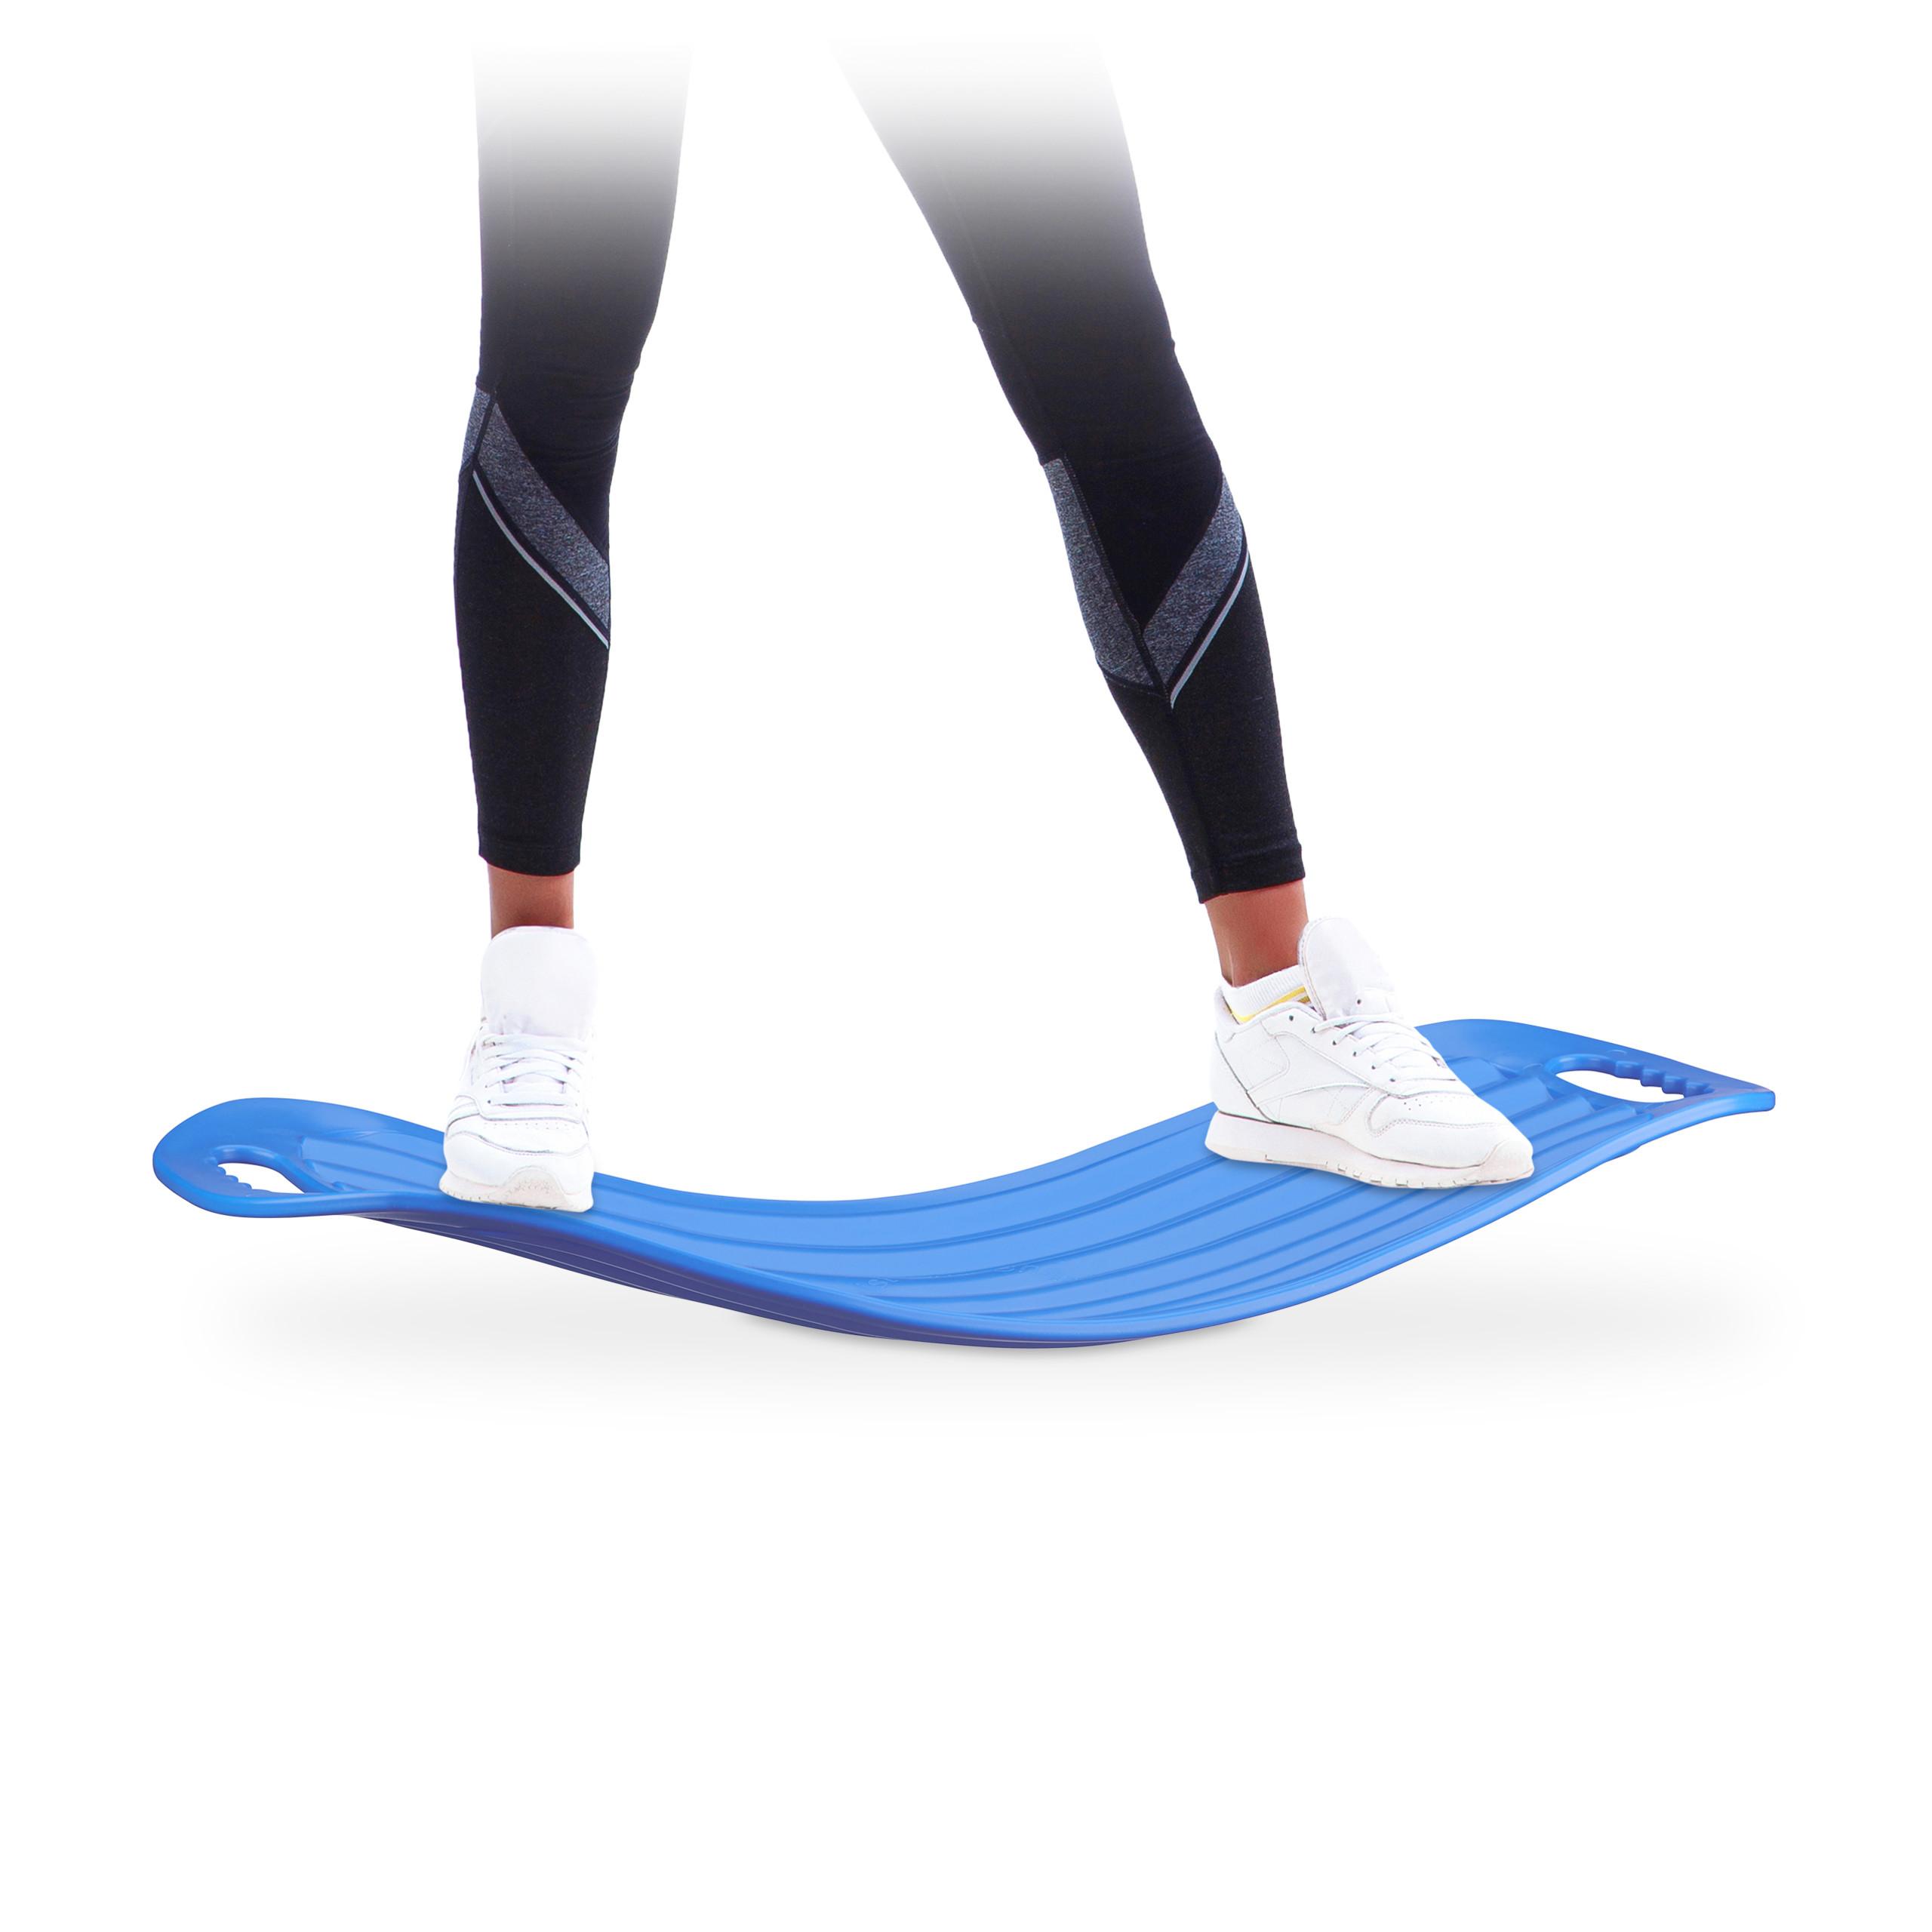 a0b836b255c6c Wellness Artikel günstig kaufen